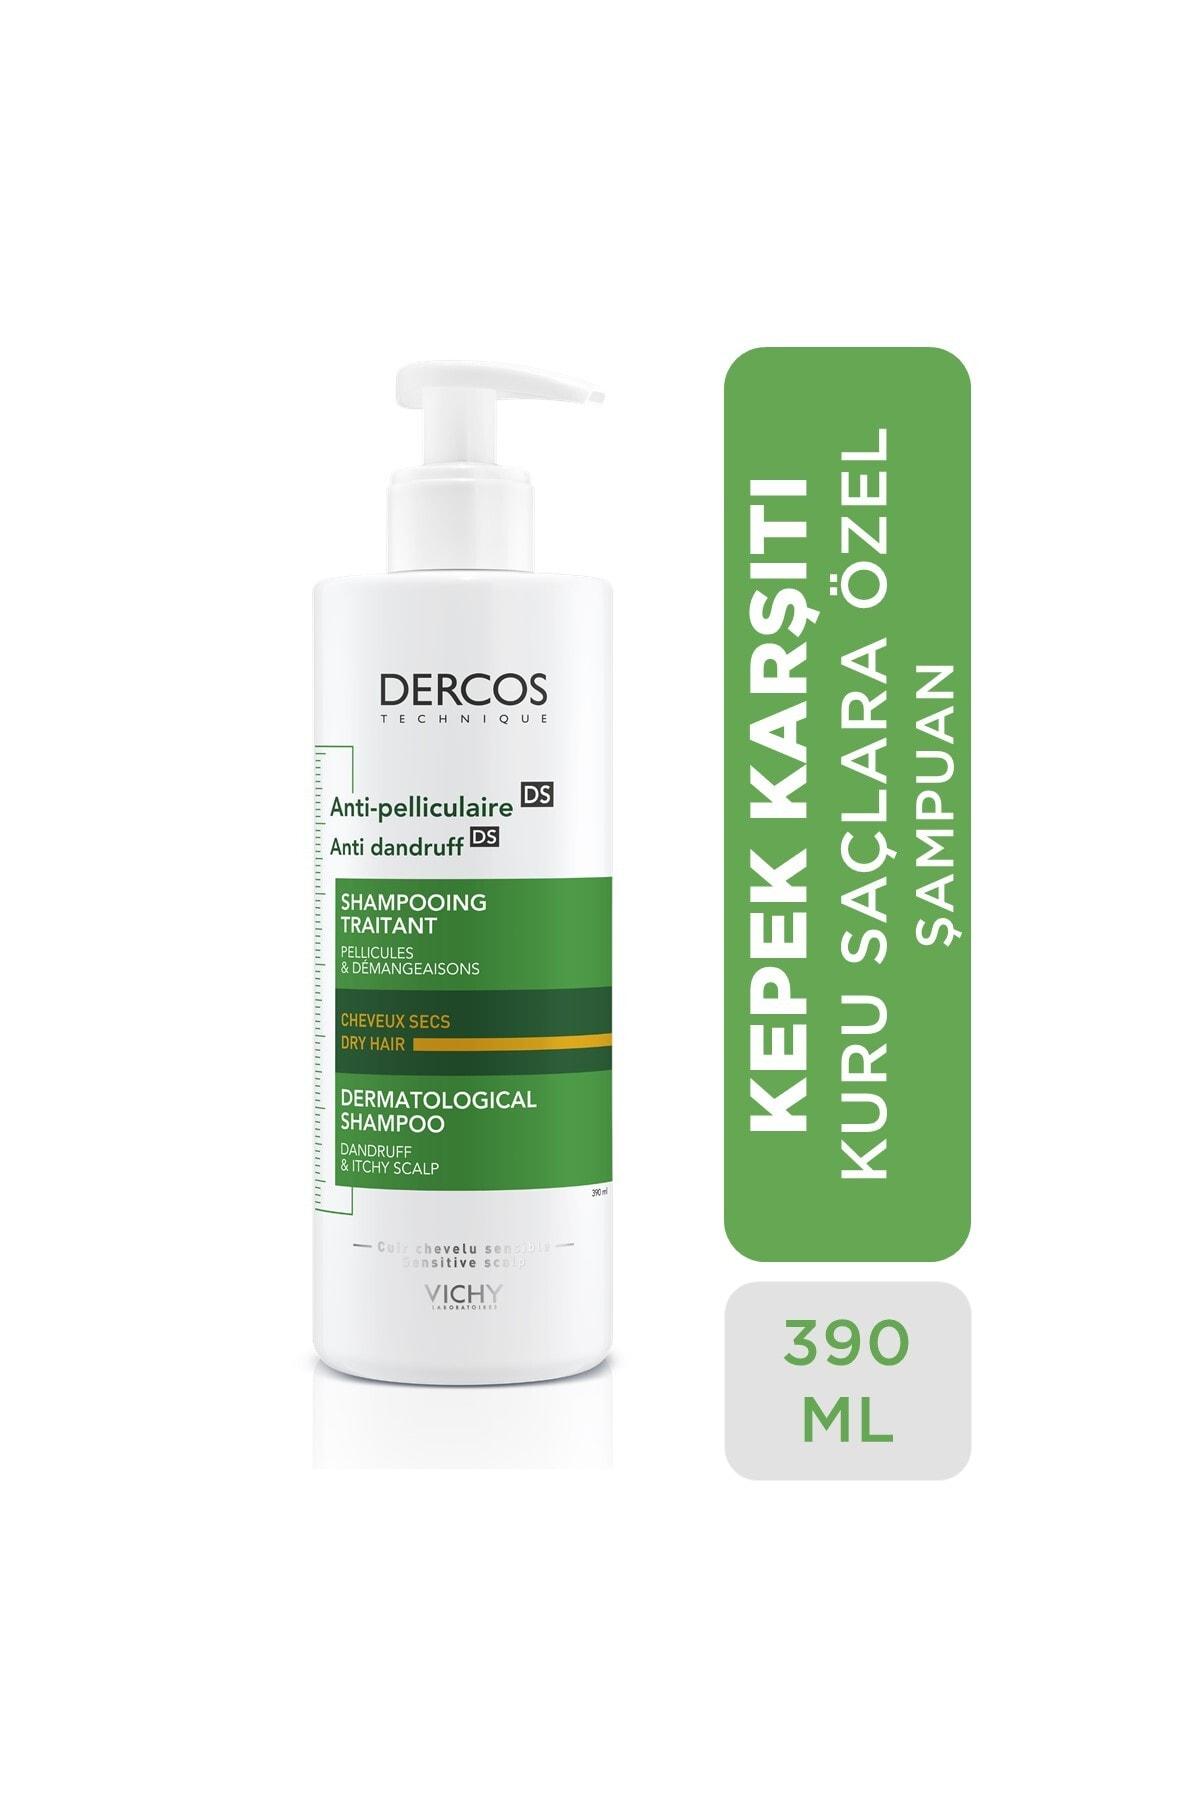 Vichy Dercos Anti Dandruff Dry Kepek Karşıtı Bakım Şampuanı 390 ml 1